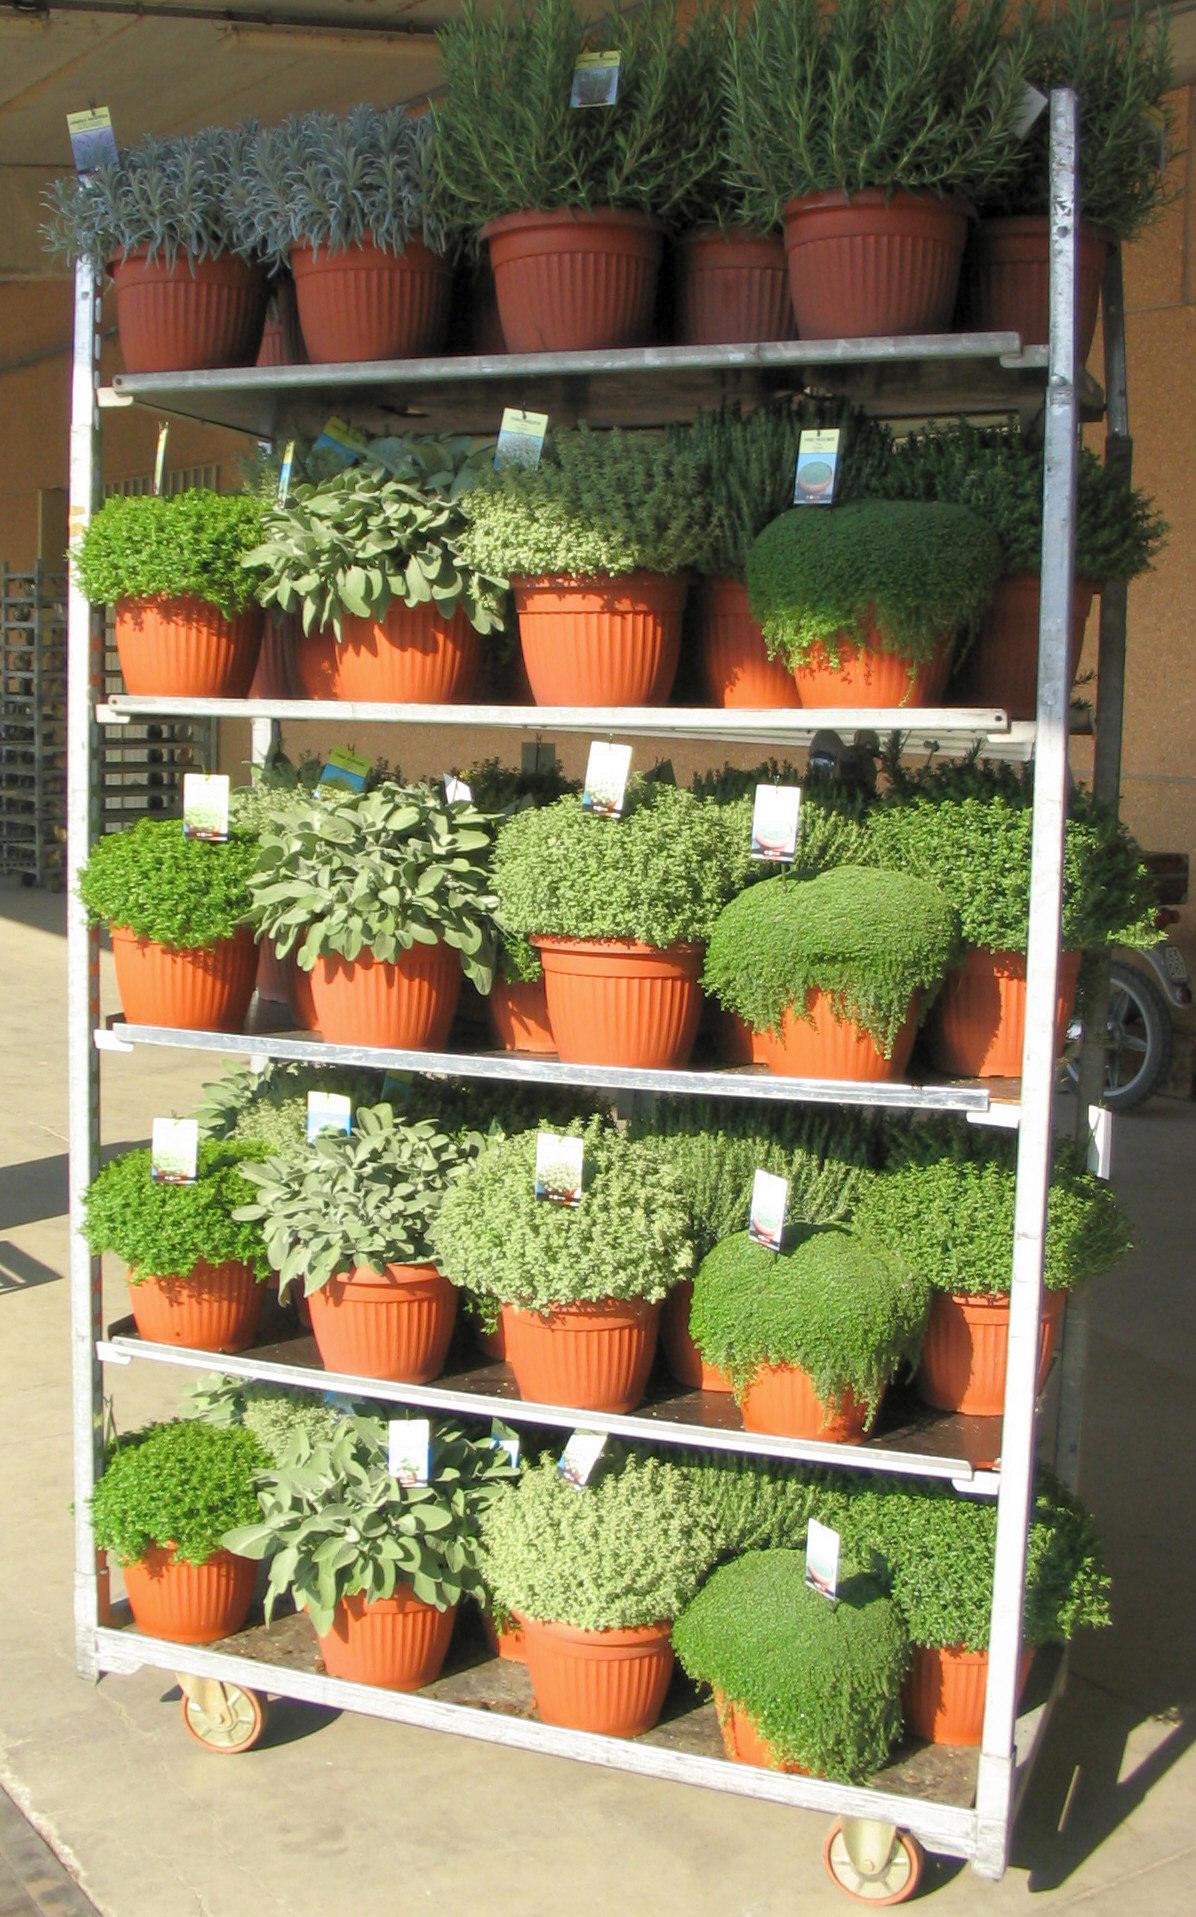 mediterrane pflanzen - green pflanzenhandel gmbh, Gartengerate ideen